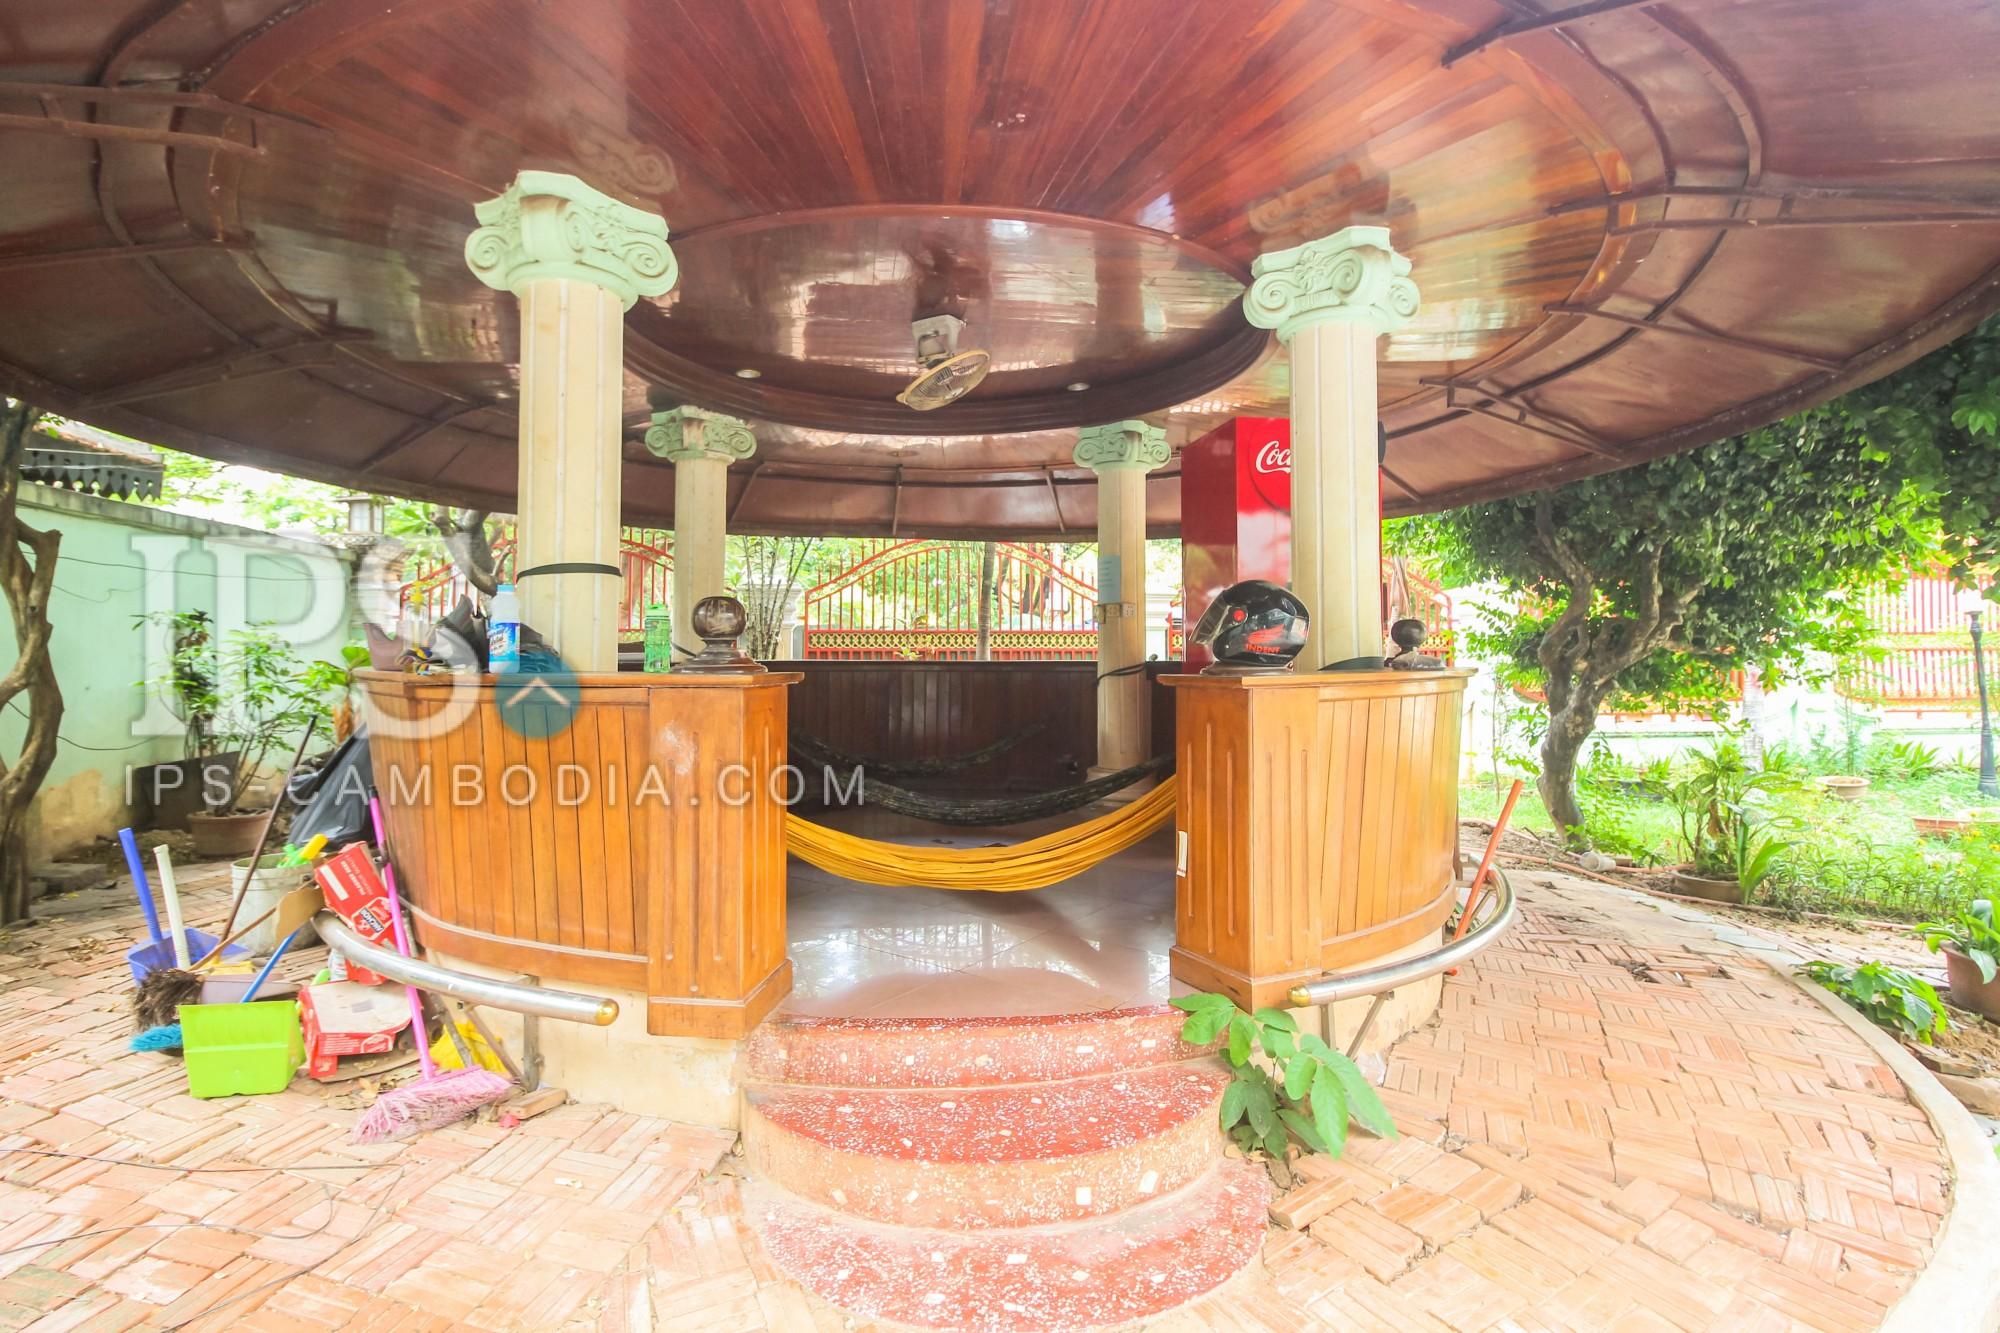 School Business For Sale - Svay Dangkum, Siem Reap